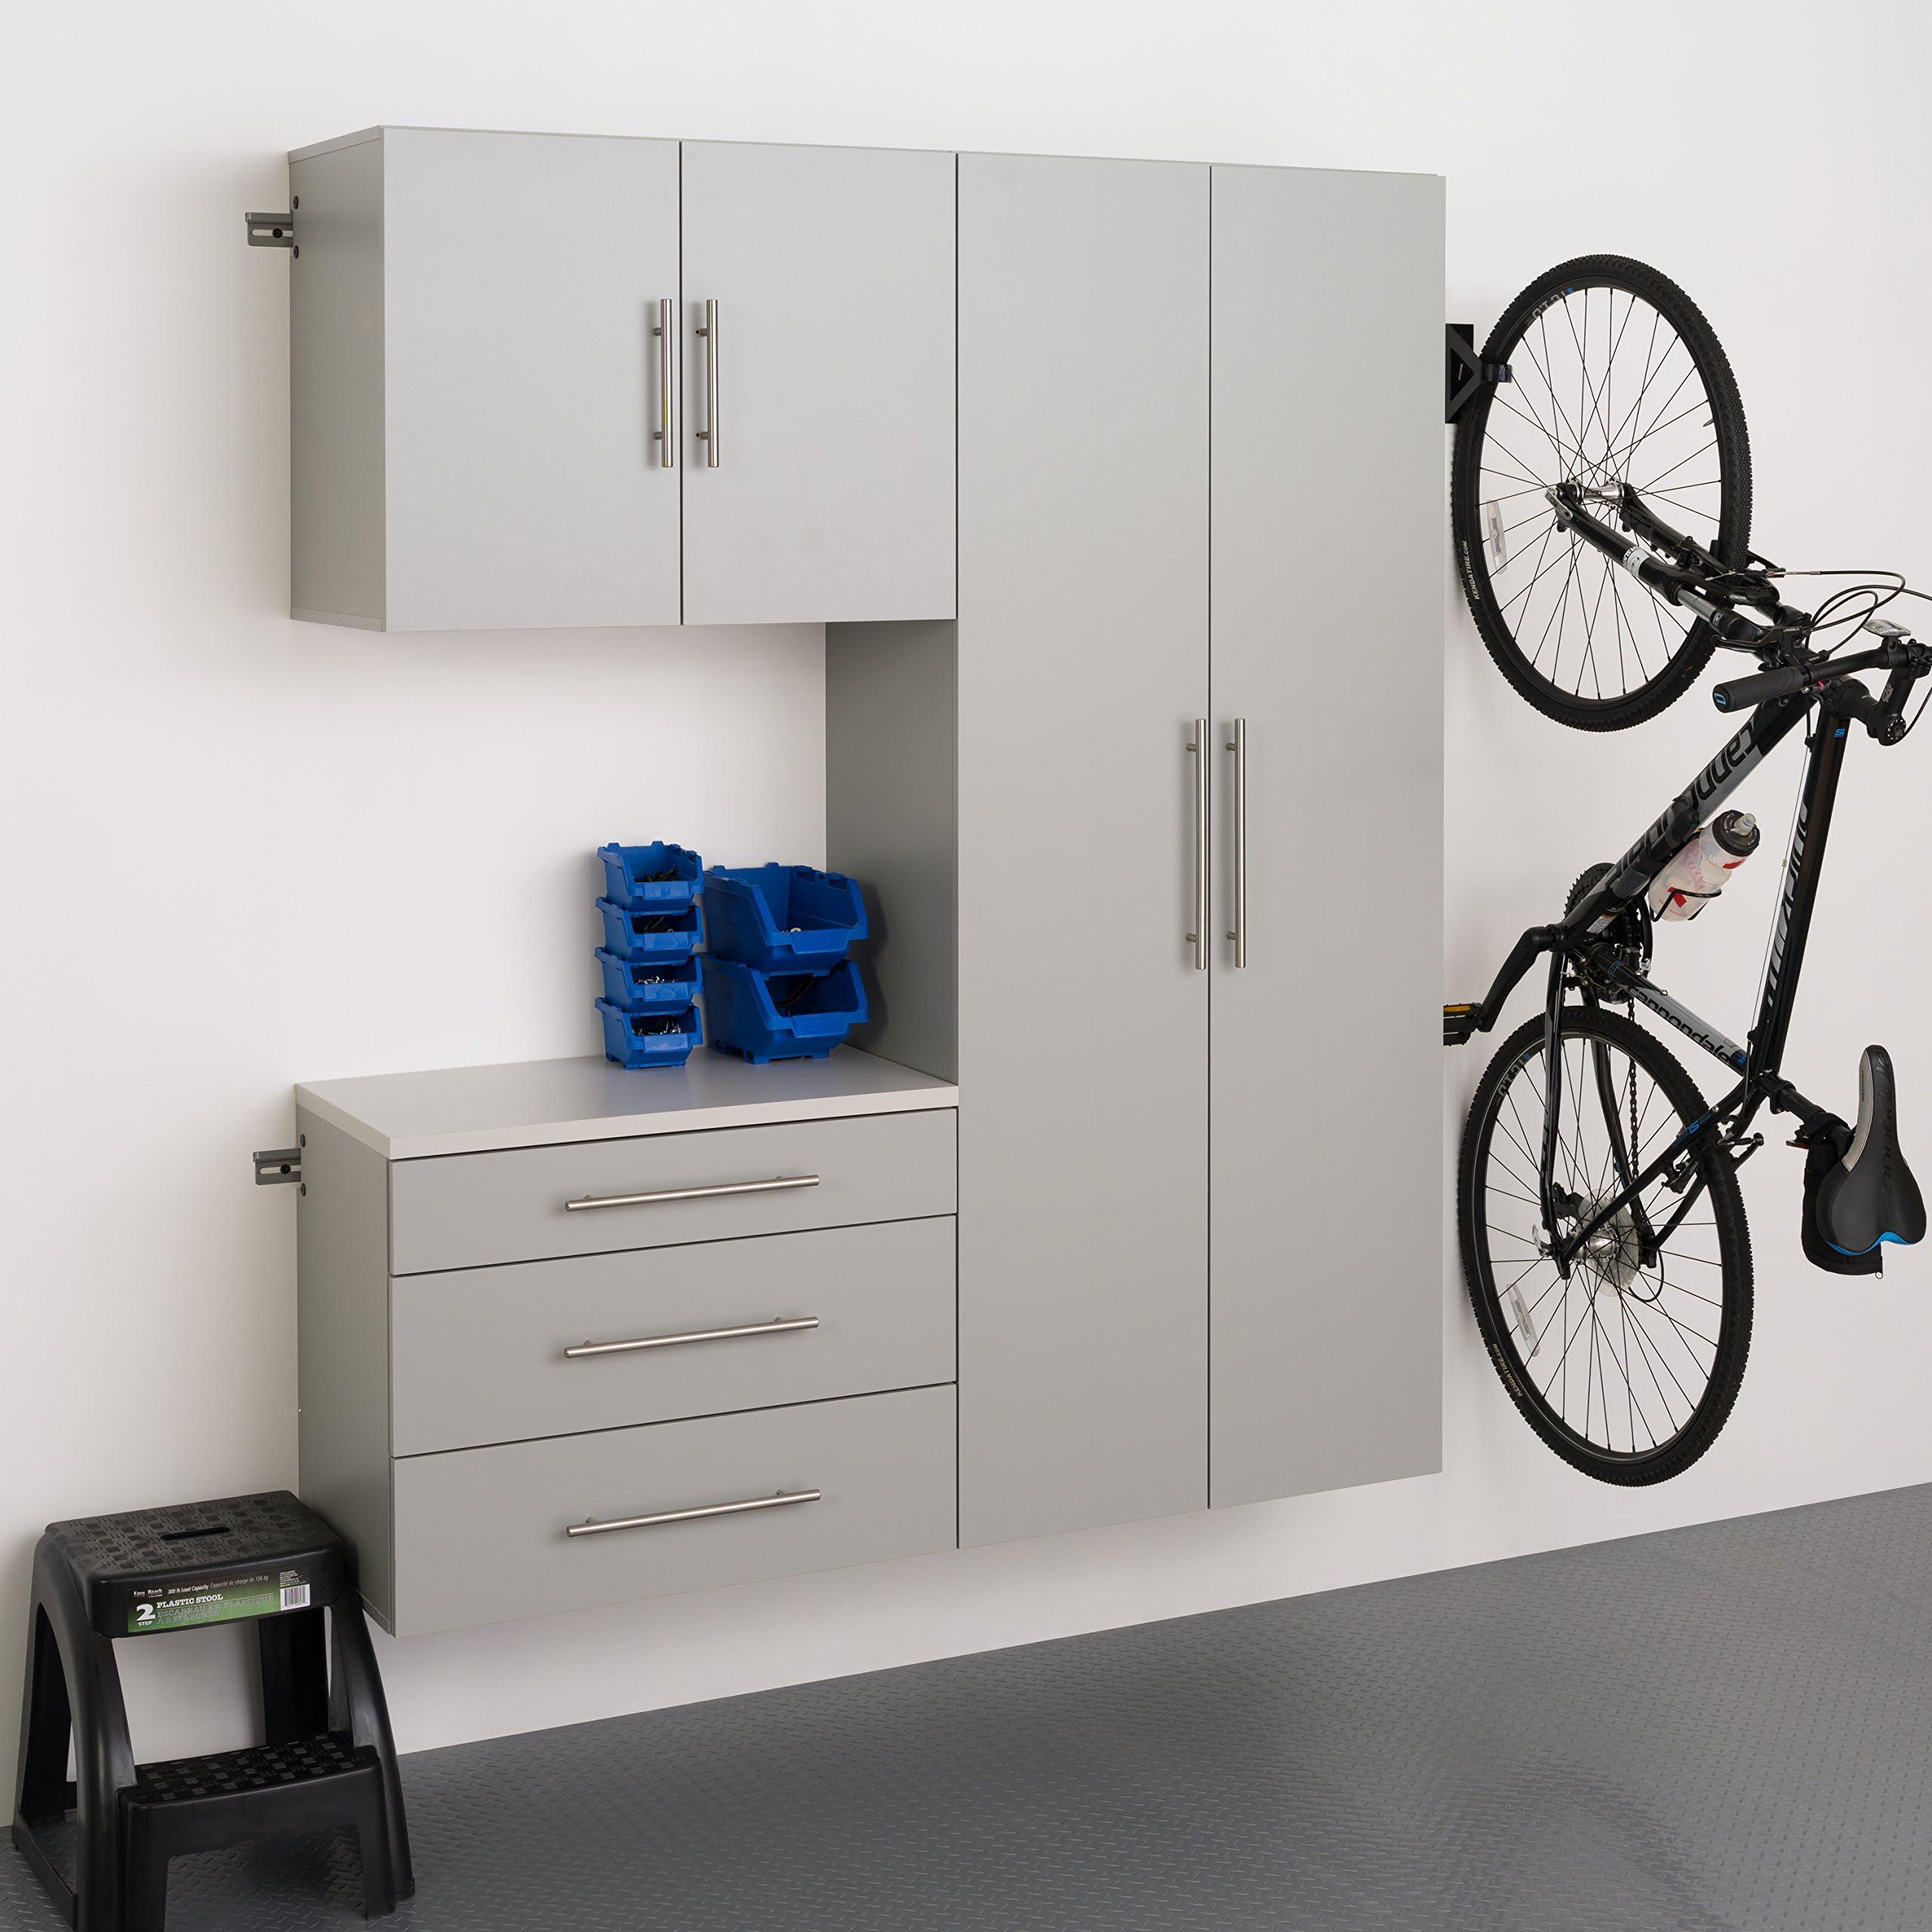 "Prepac HangUps 60"" Storage Cabinet B-3pc, Set B - 3 pc, Light Gray"